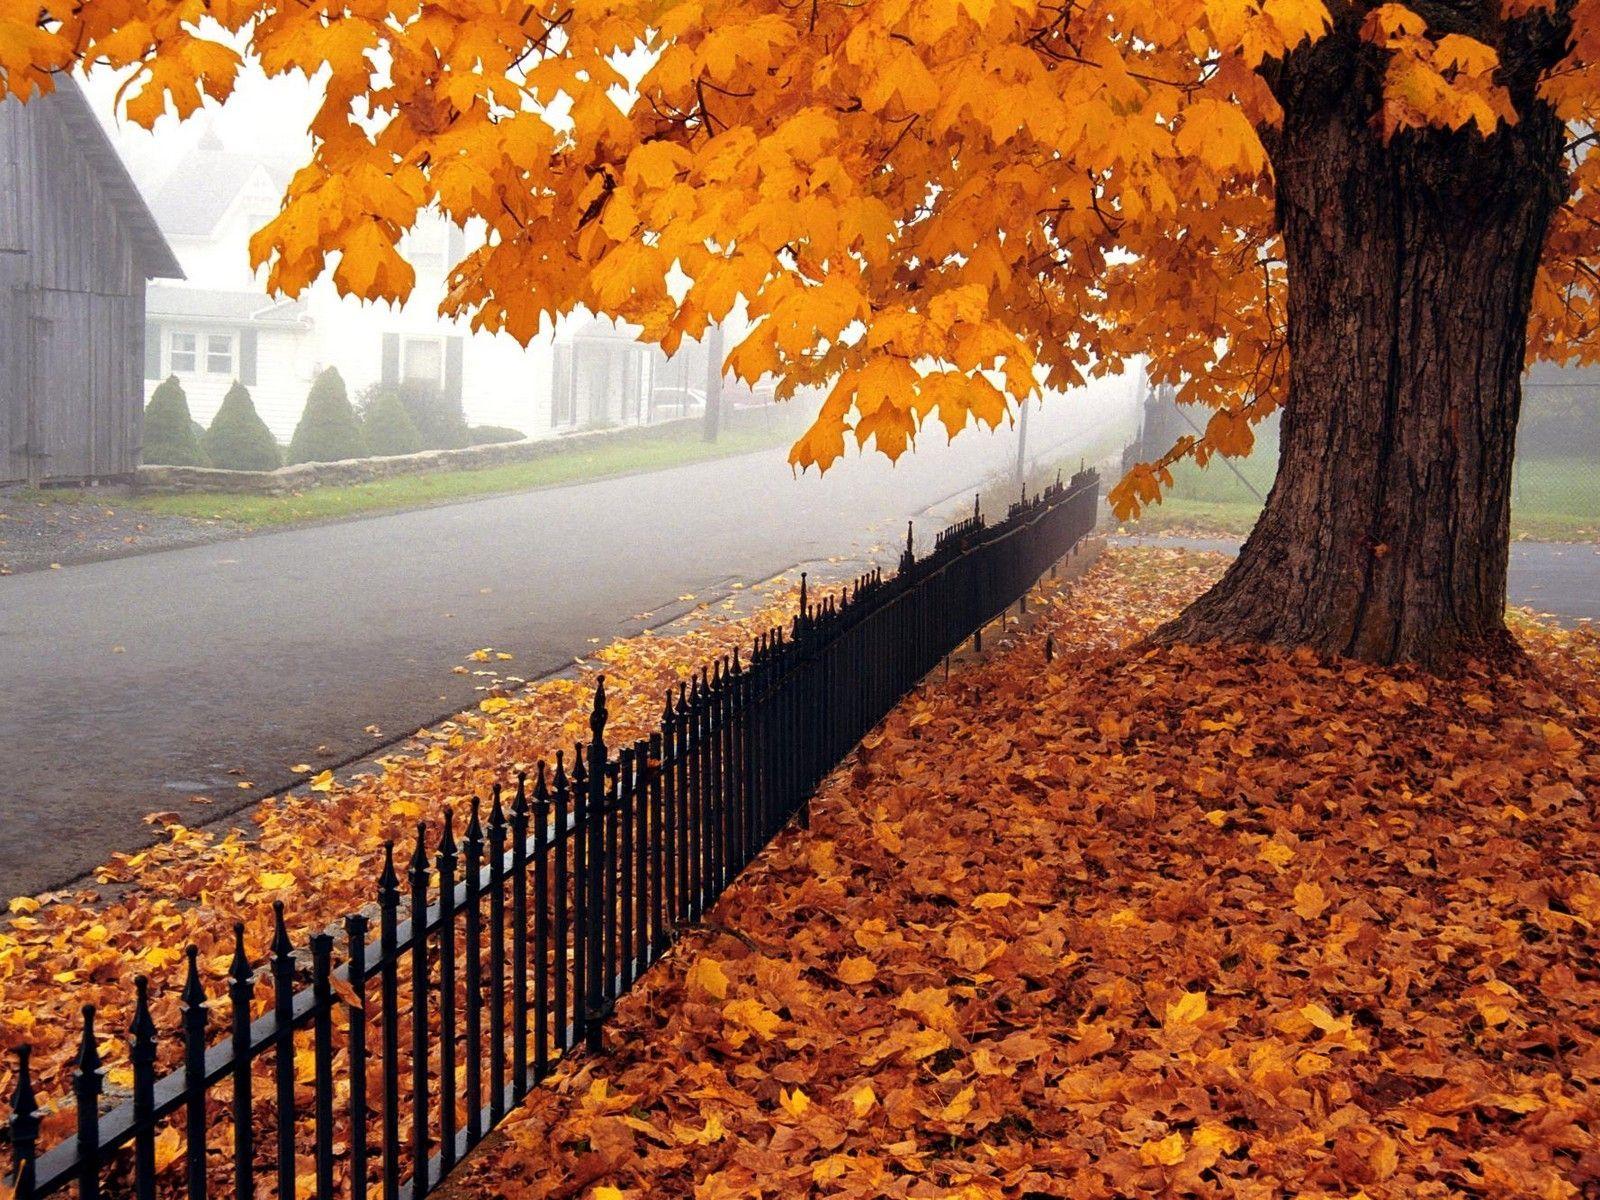 Desktop Wallpaper Hd 3d Full Screen Autumn Trees Fall Colors Scenery